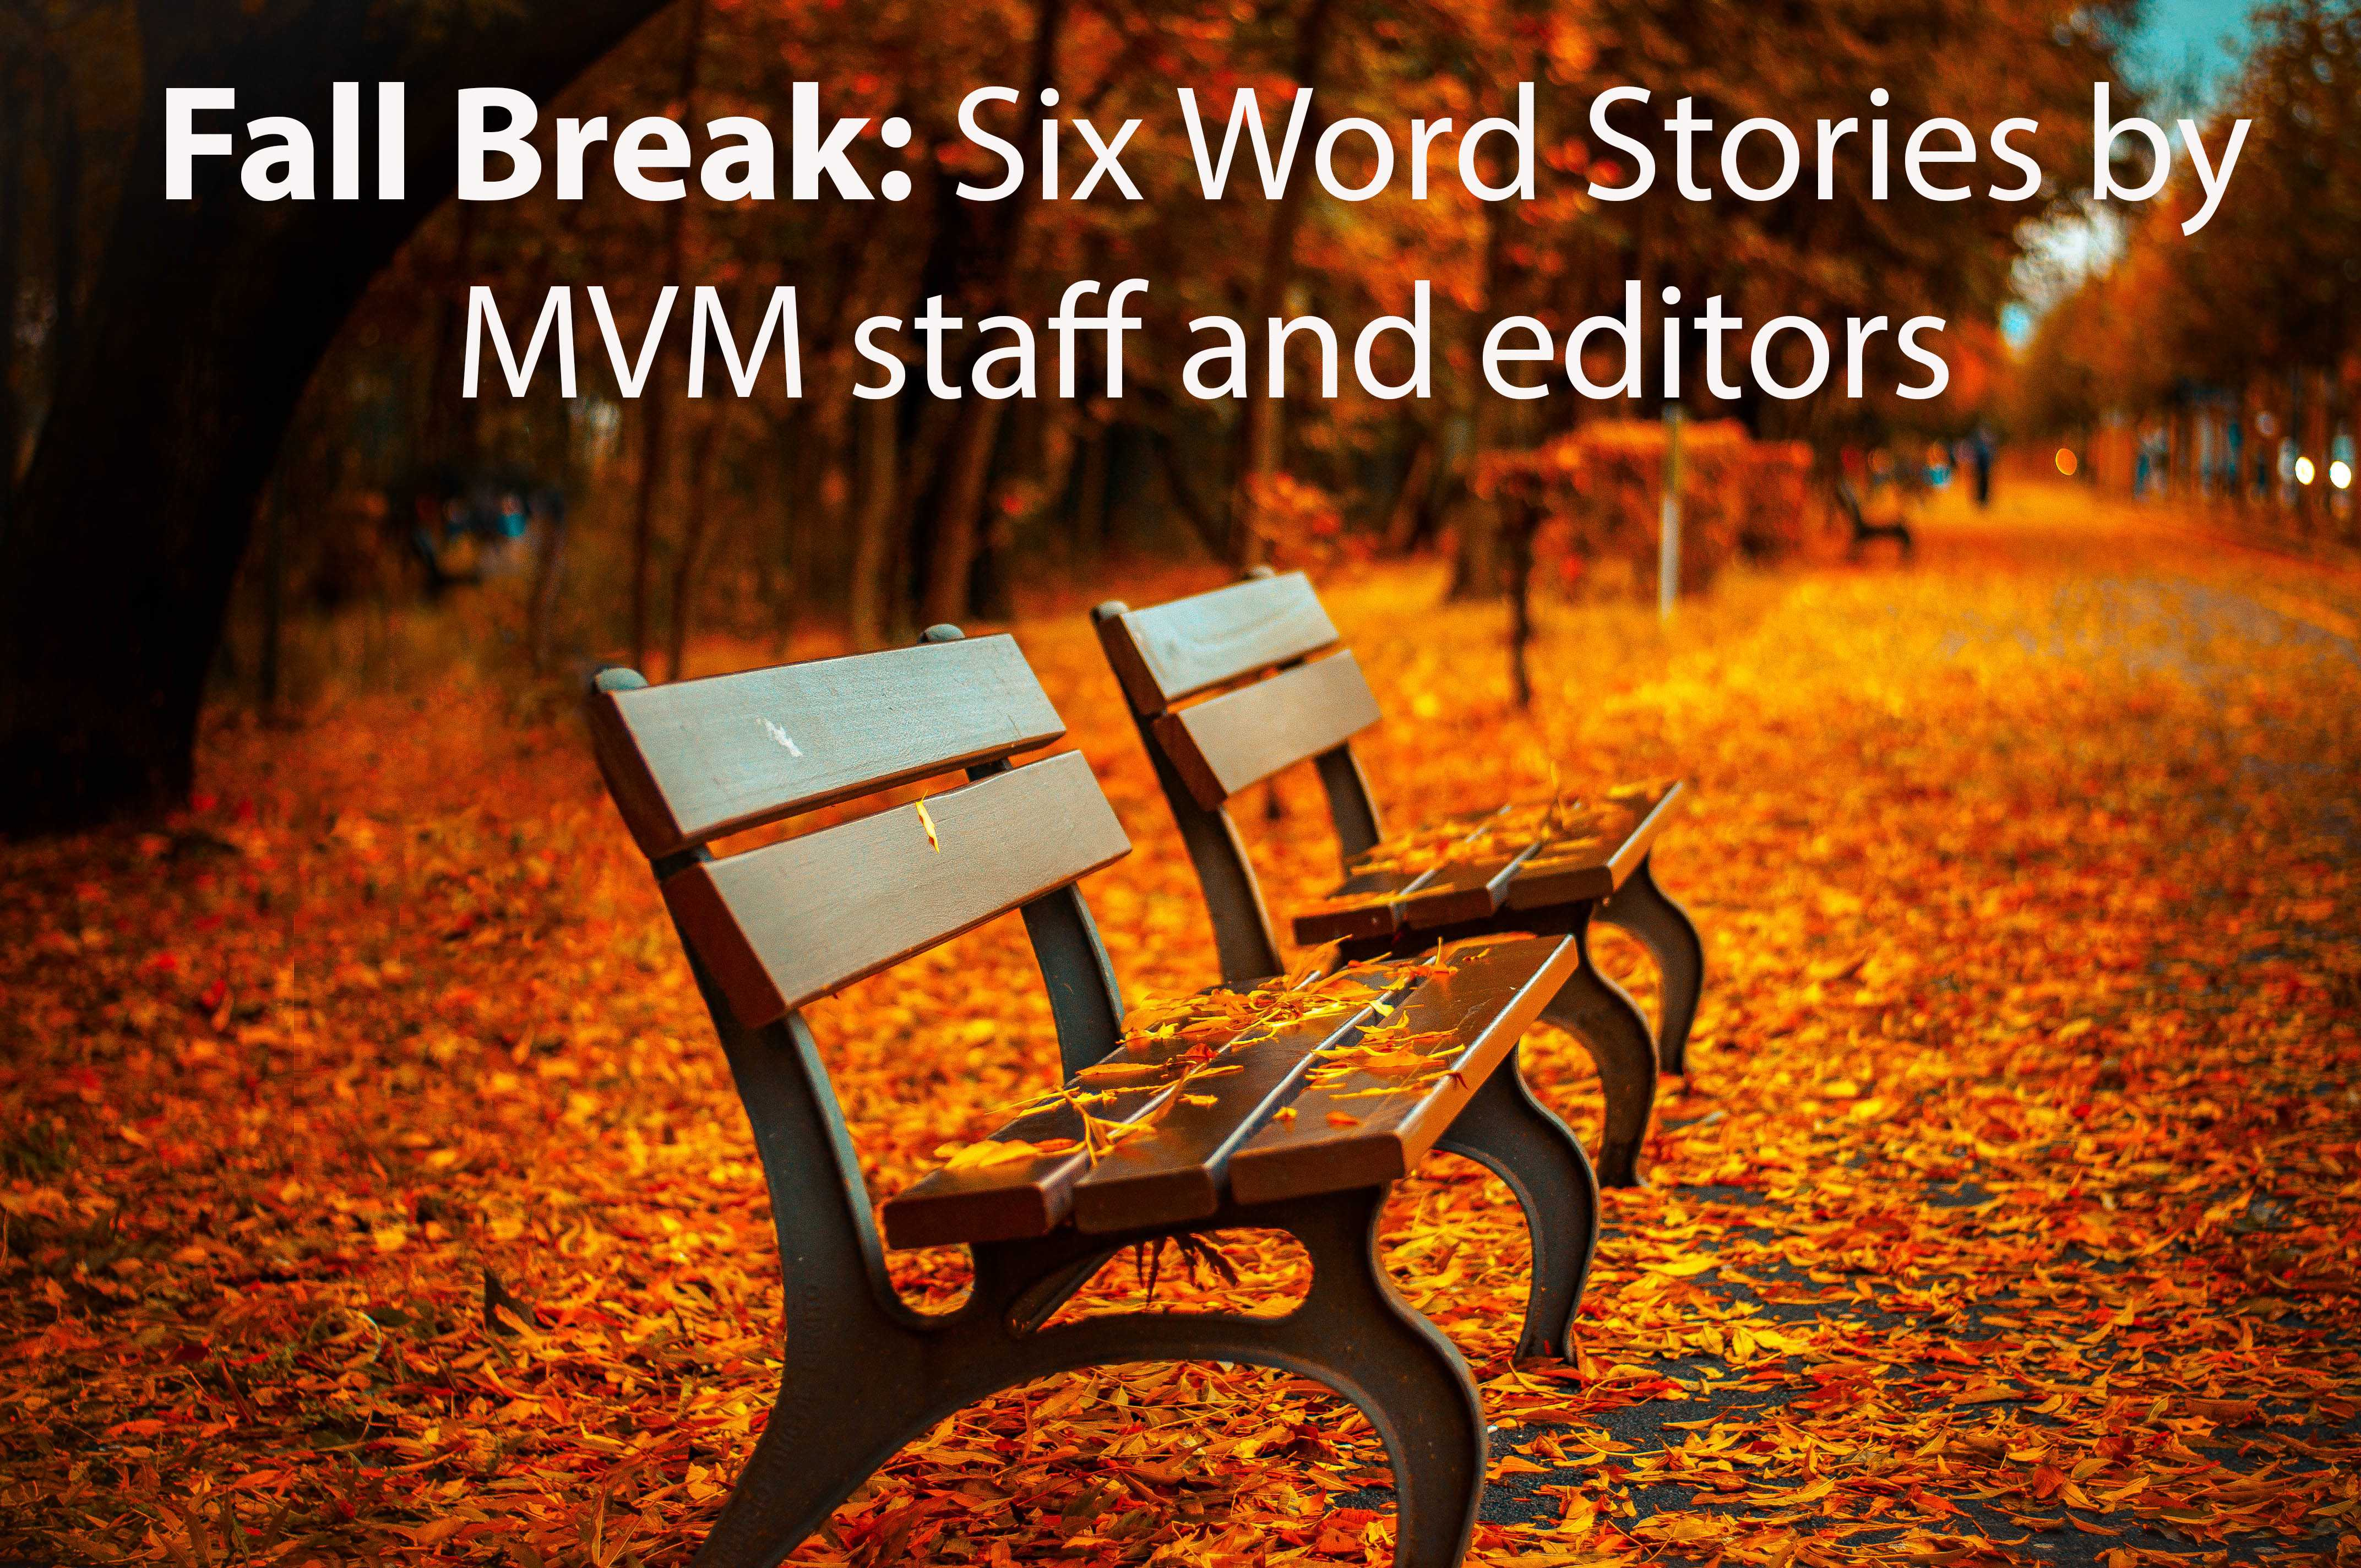 Mountain Vista Media: Six Word Stories